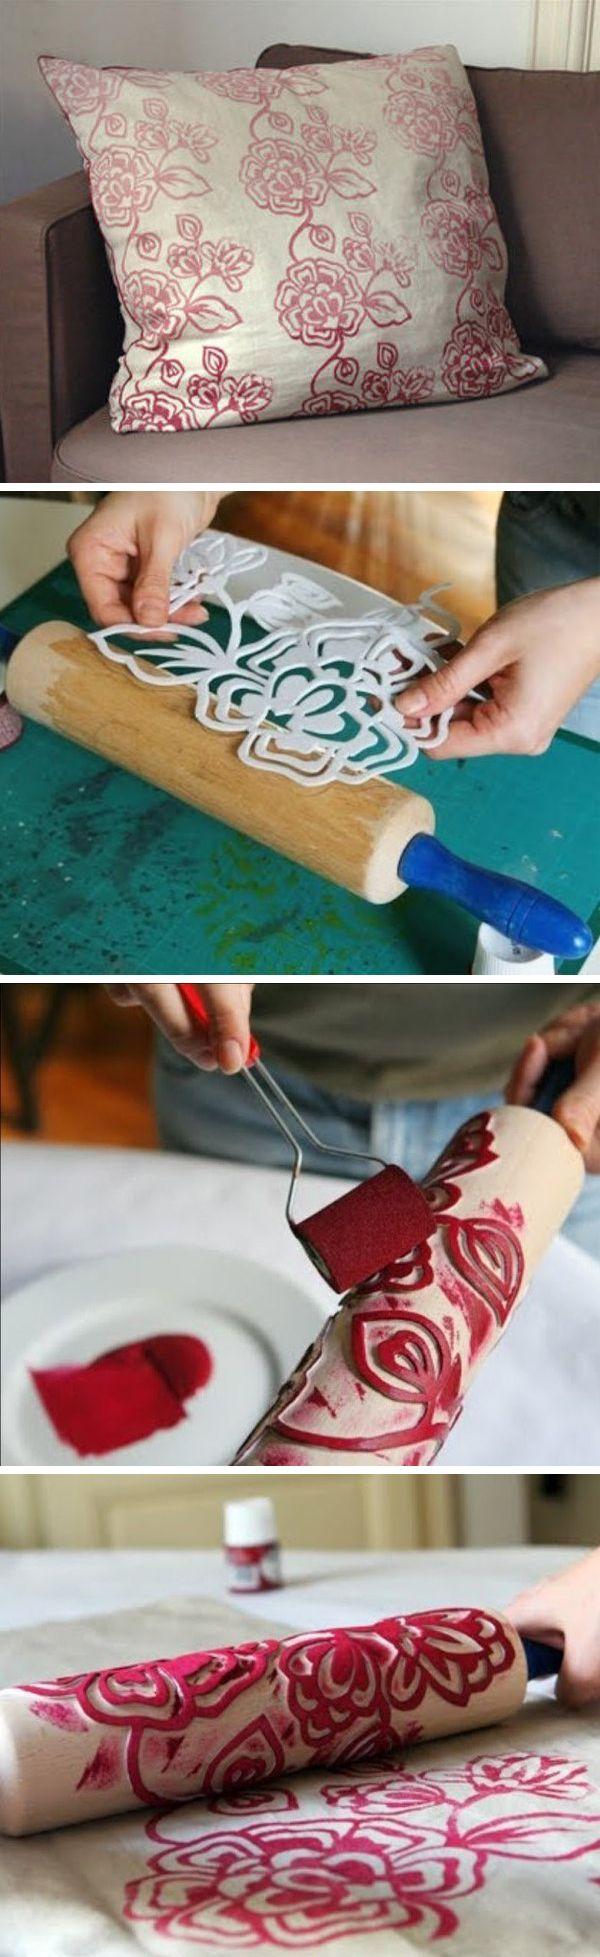 Crear un cojín con diseño en foami sobre rodillo